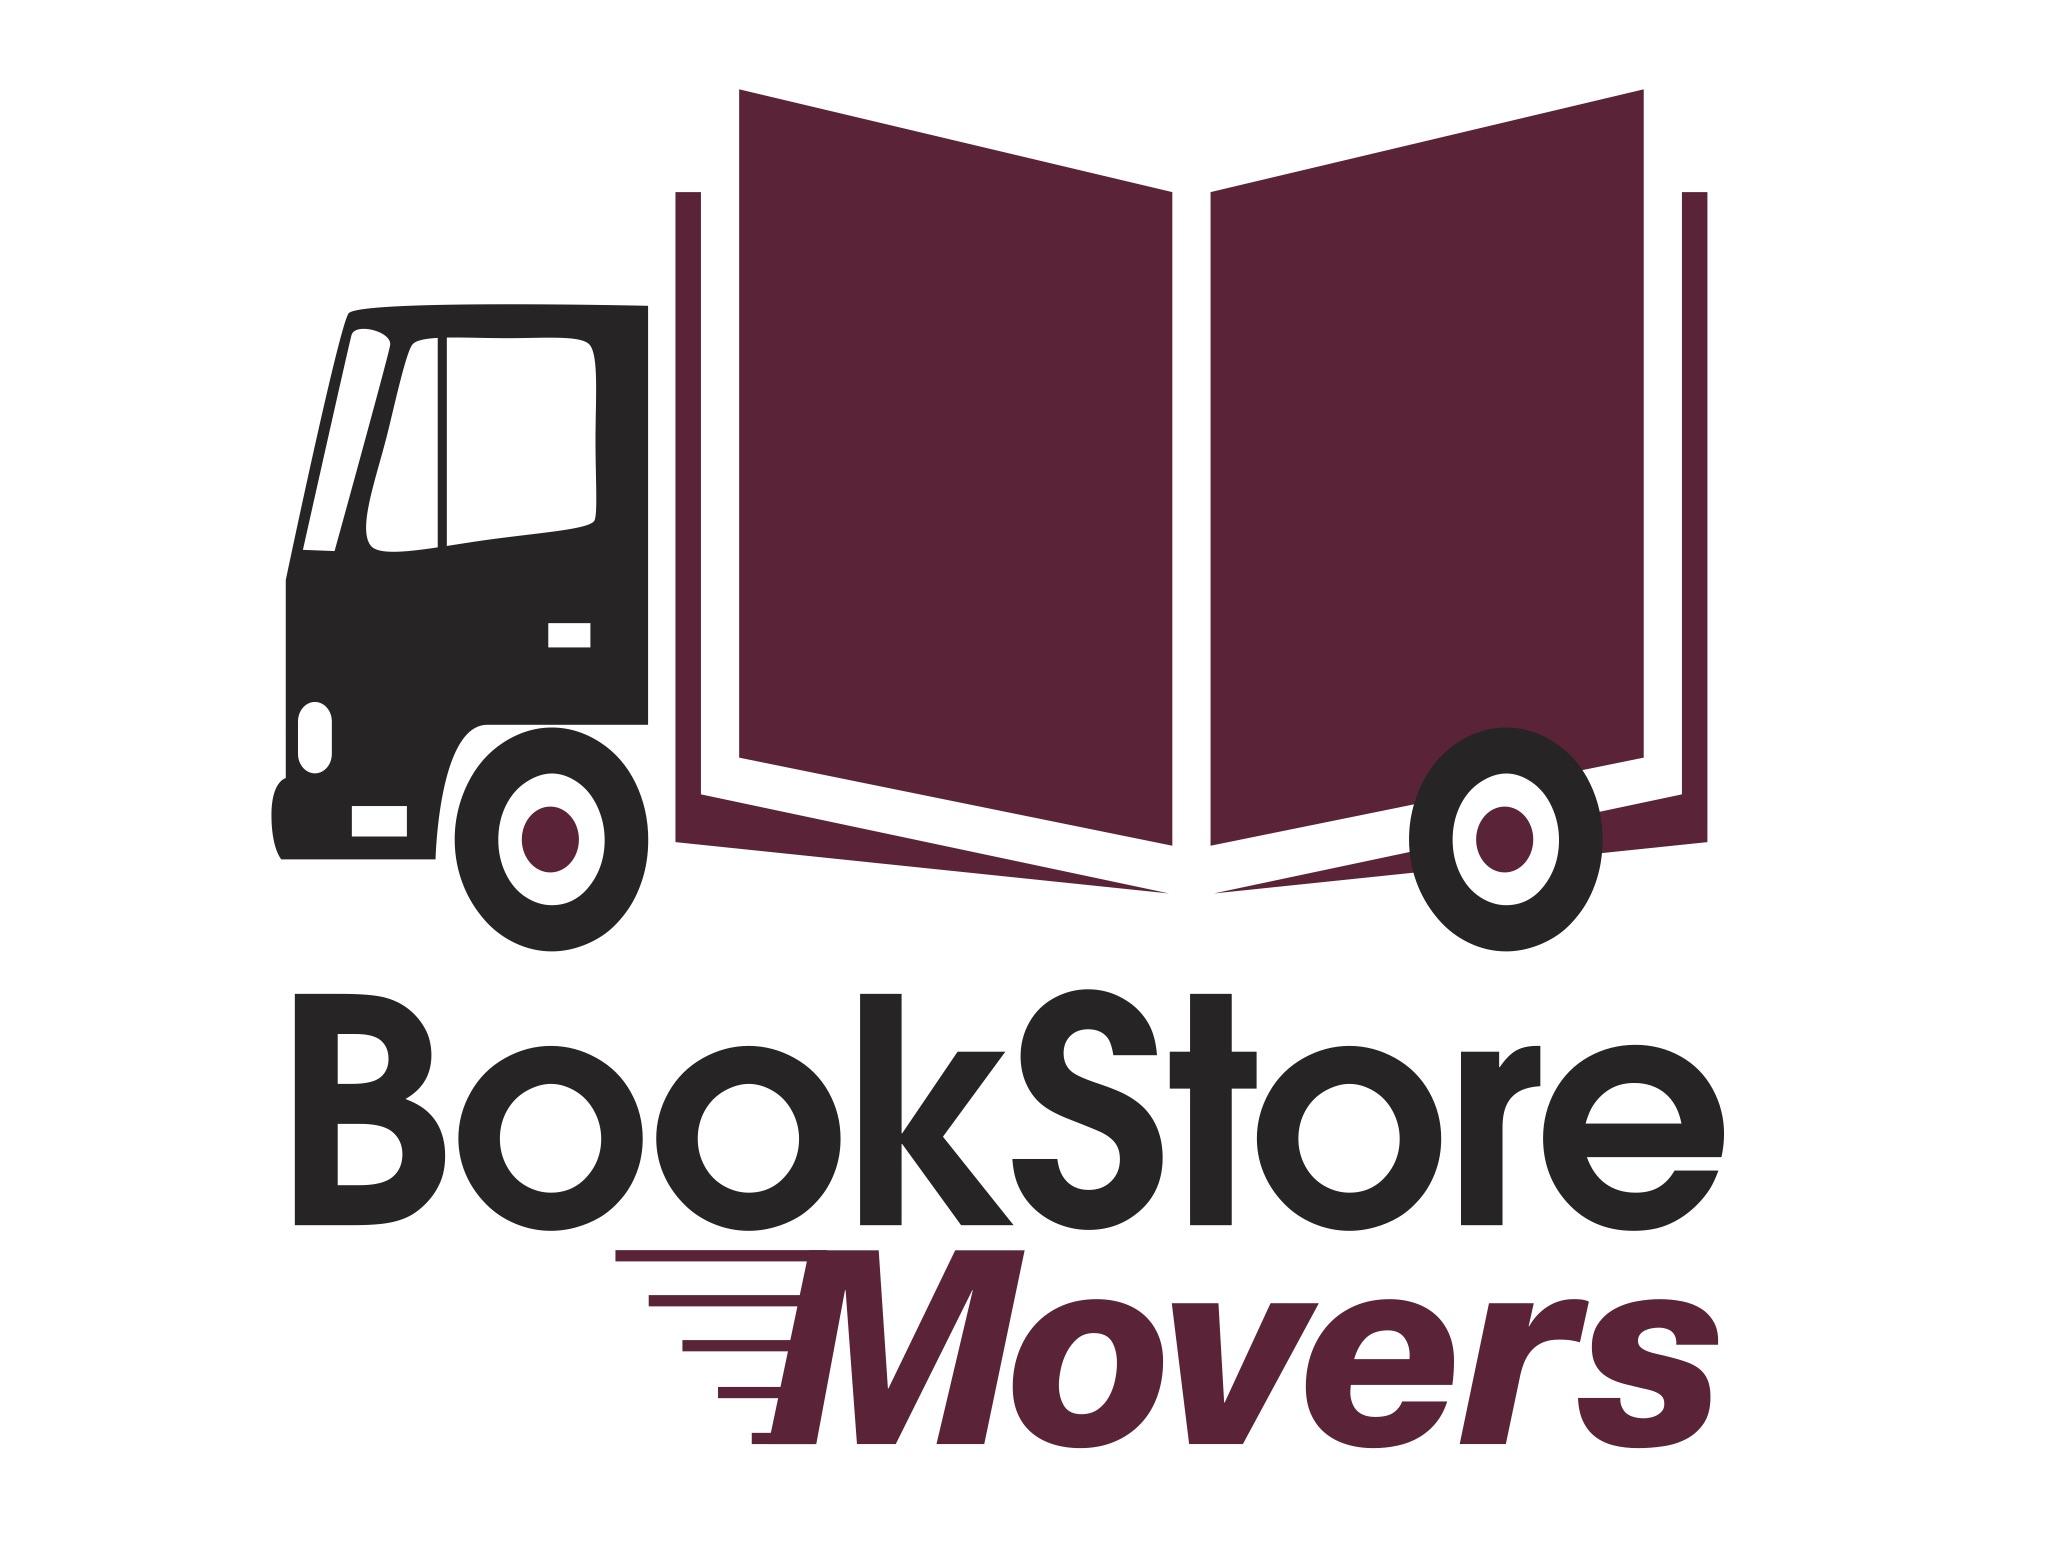 Bookstore Movers3Logo.jpg